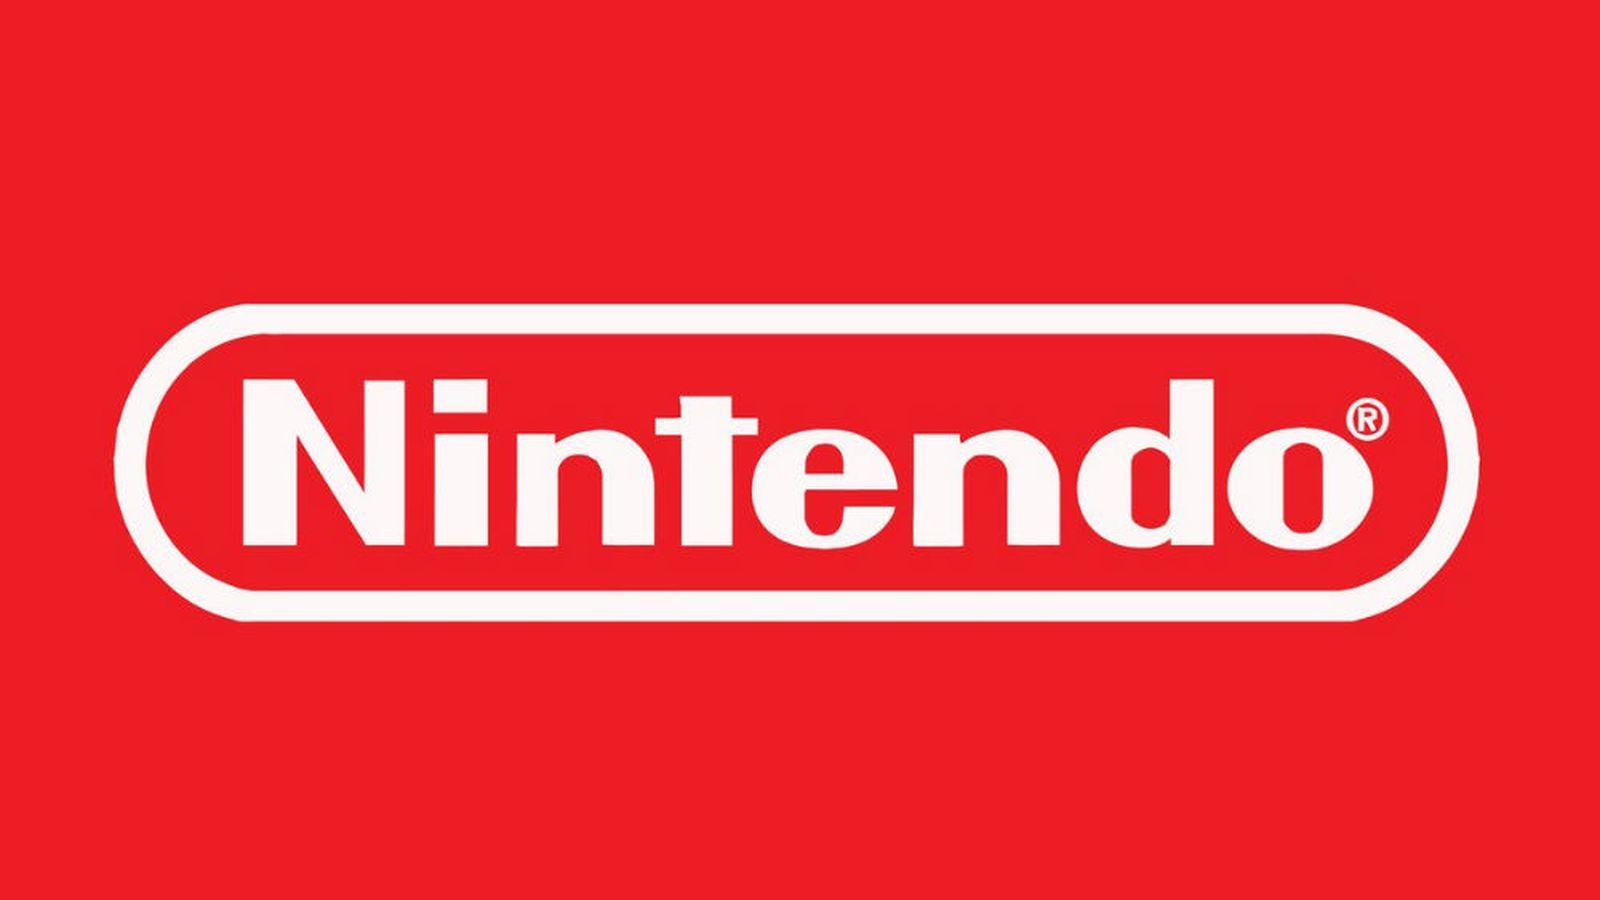 NX fervor runs rampant all over Nintendo's social feeds | Polygon